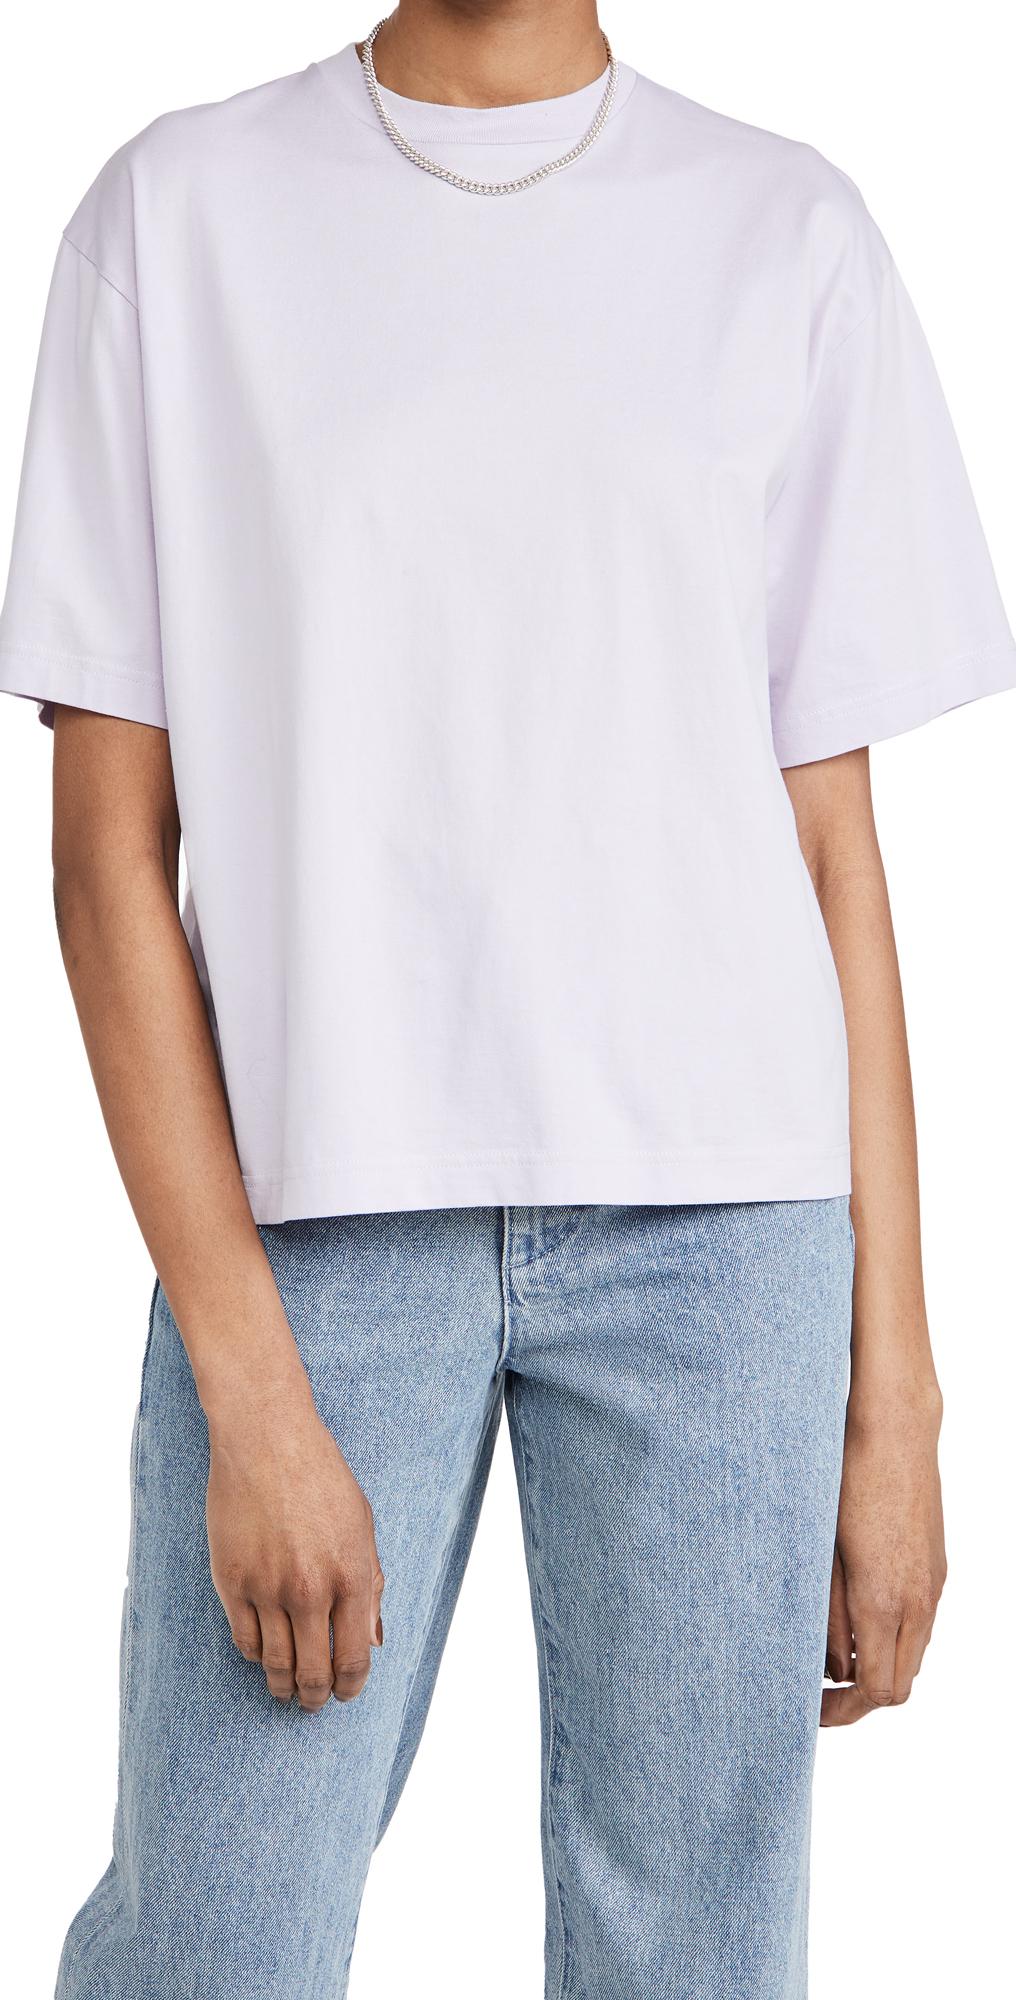 Acne Studios Straight Fit T-Shirt